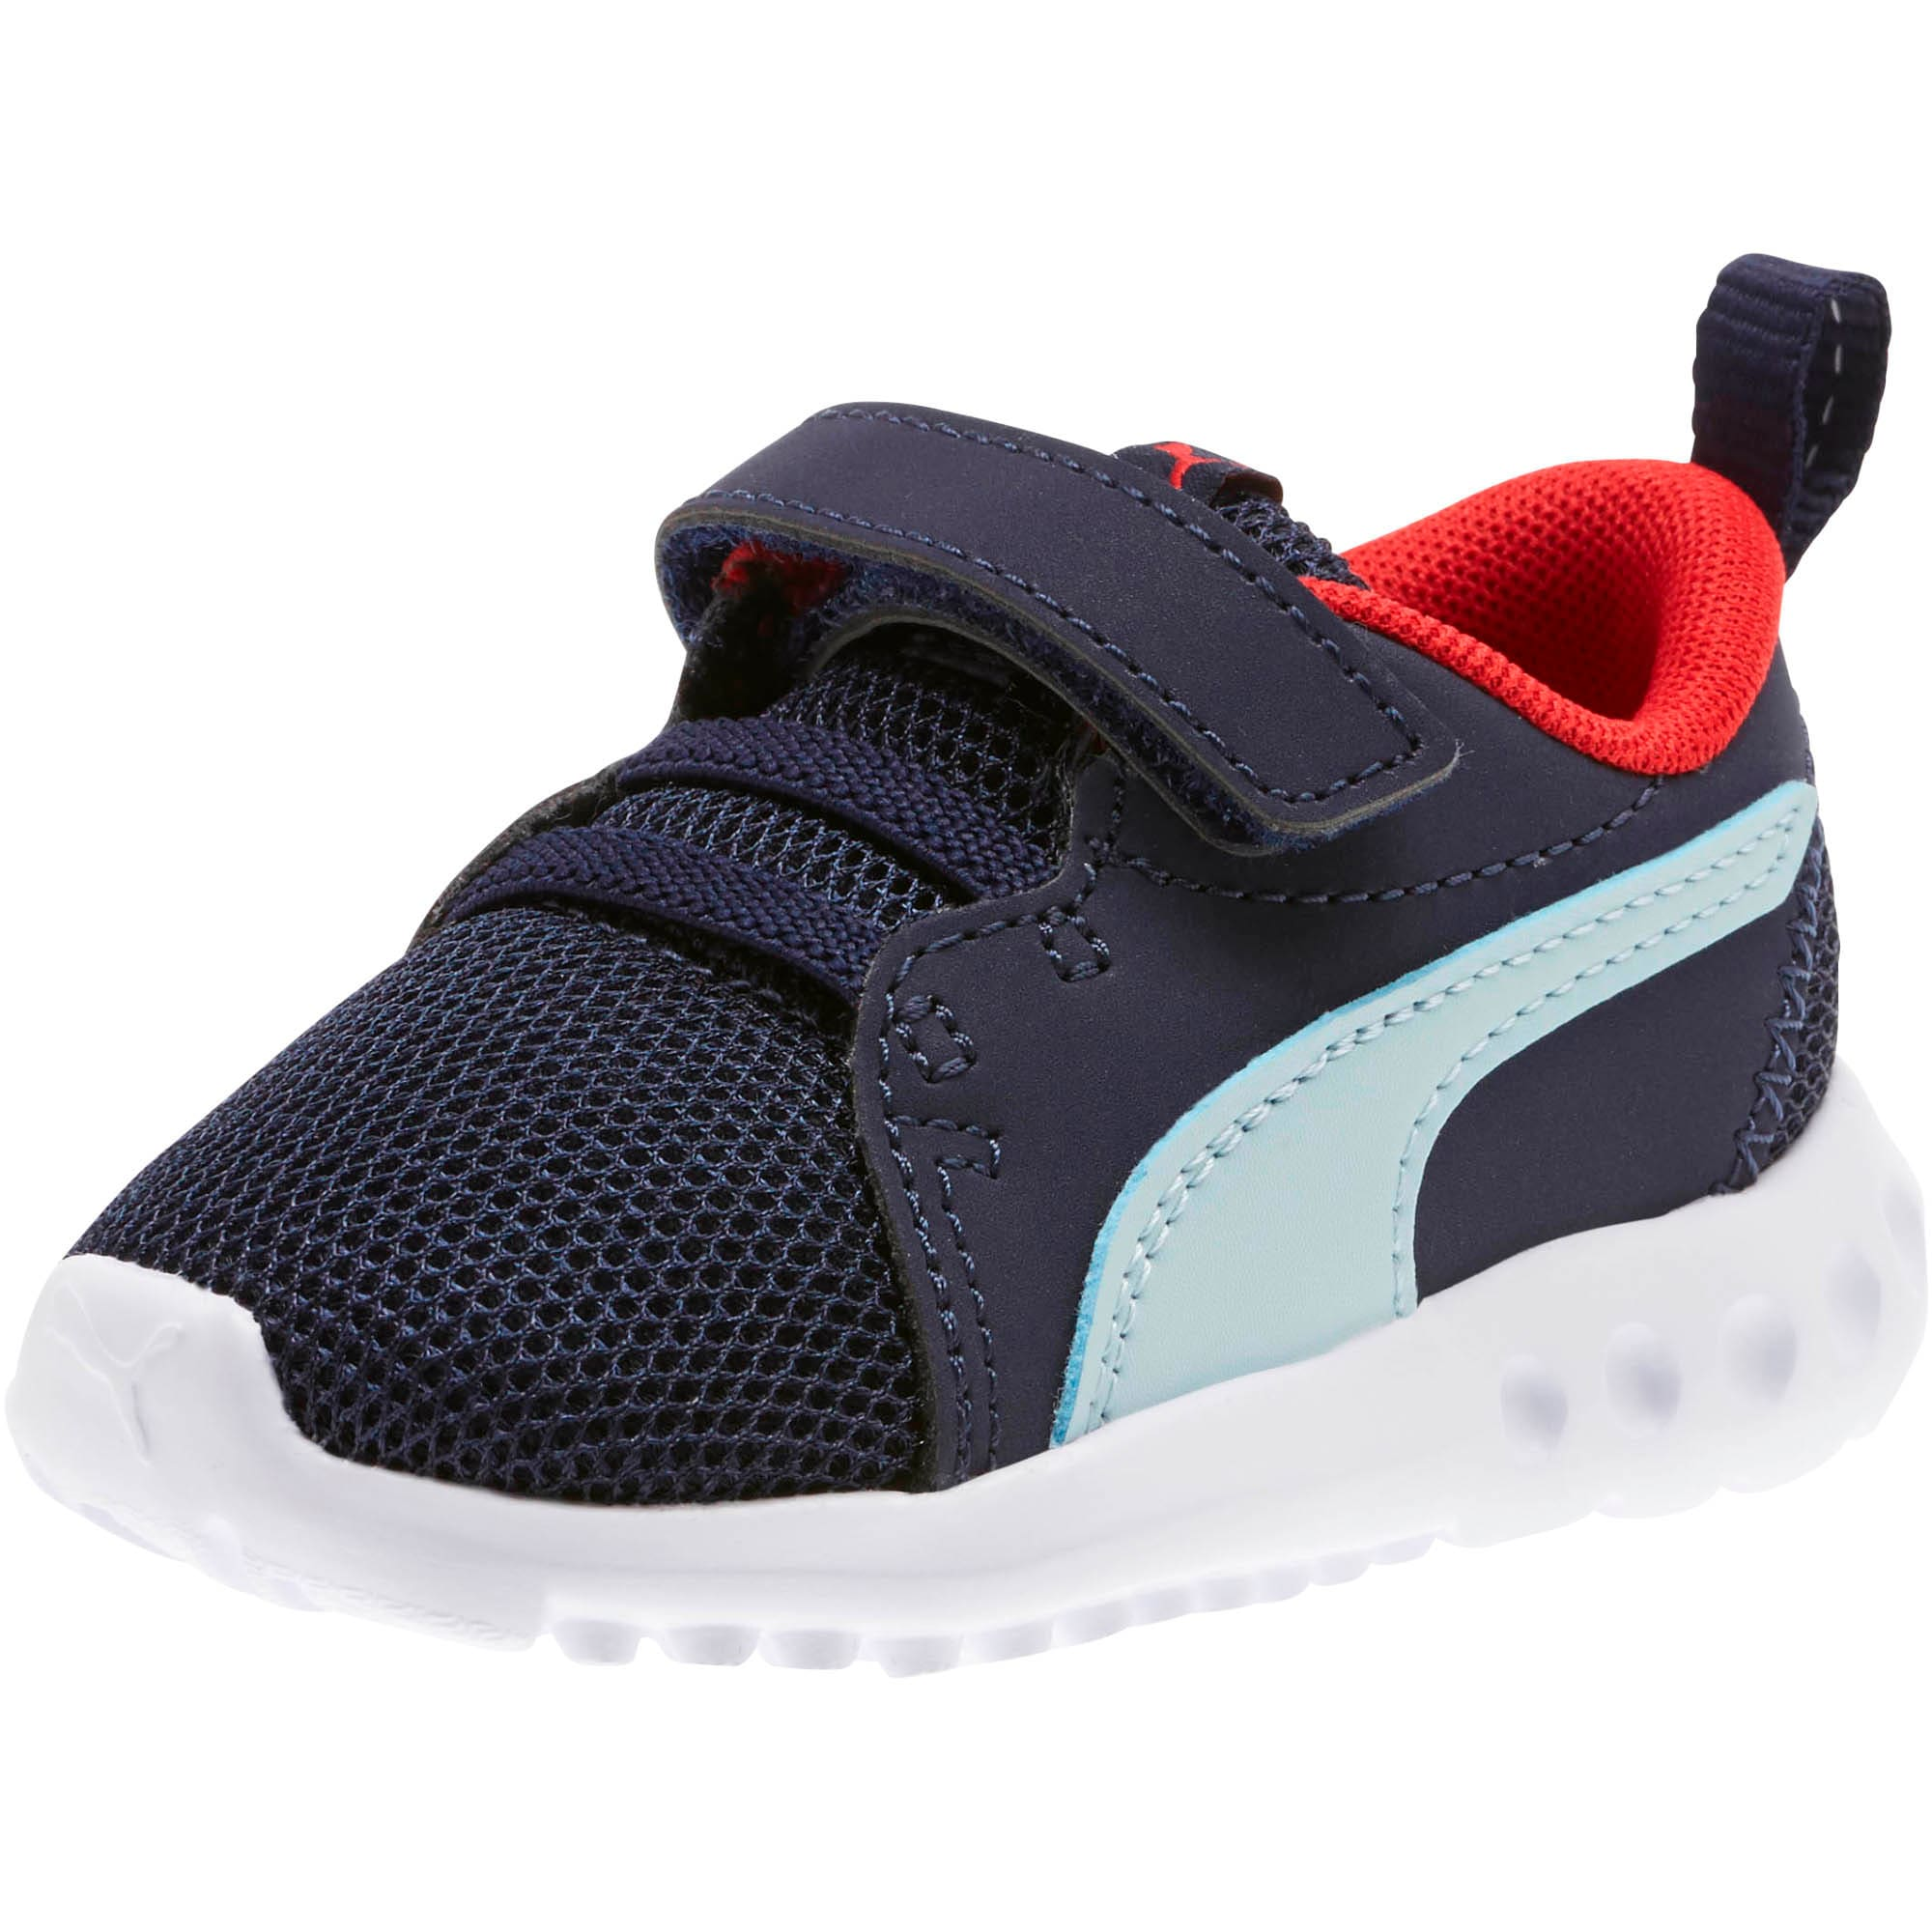 Miniatura 1 de Zapatos Carson2 Casual para bebés, Peacoat-Light Sky-Red, mediano